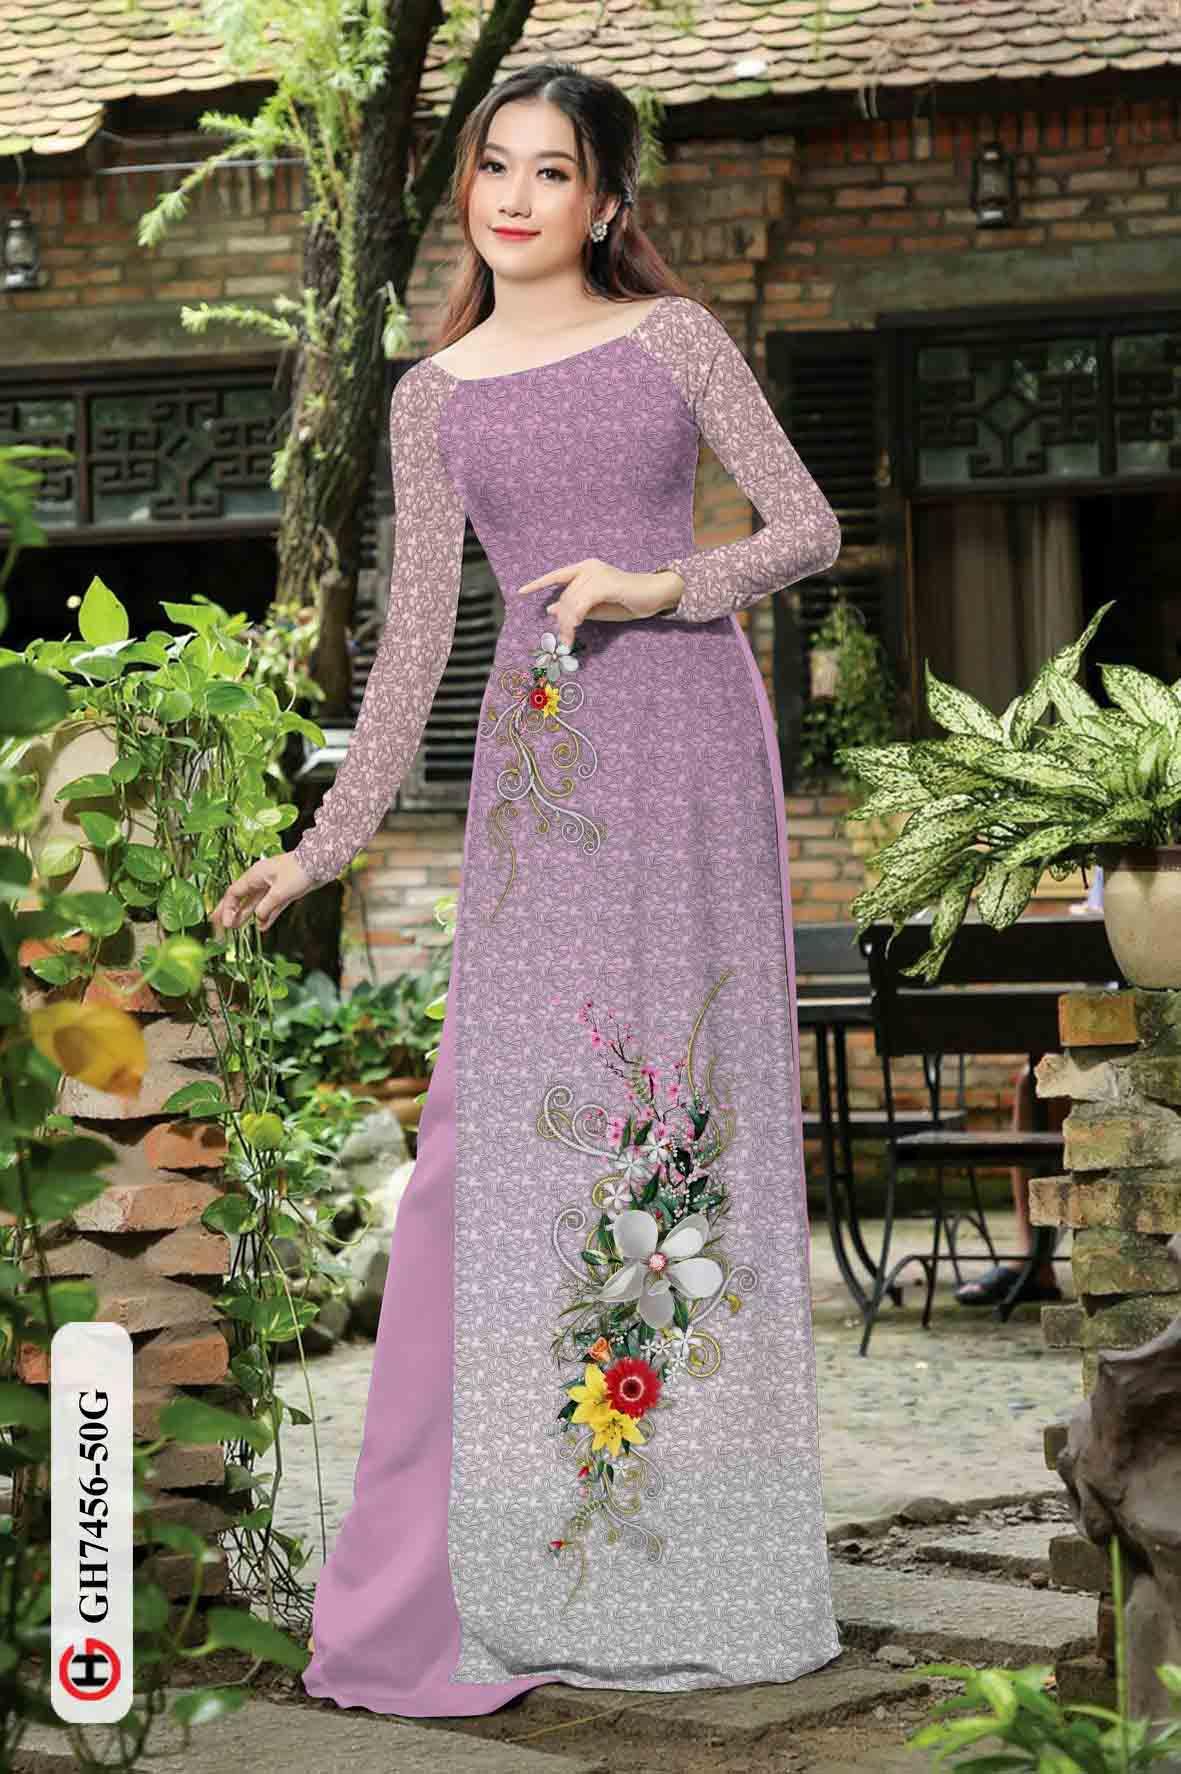 Vải áo dài hoa in 3D AD GH7456 43